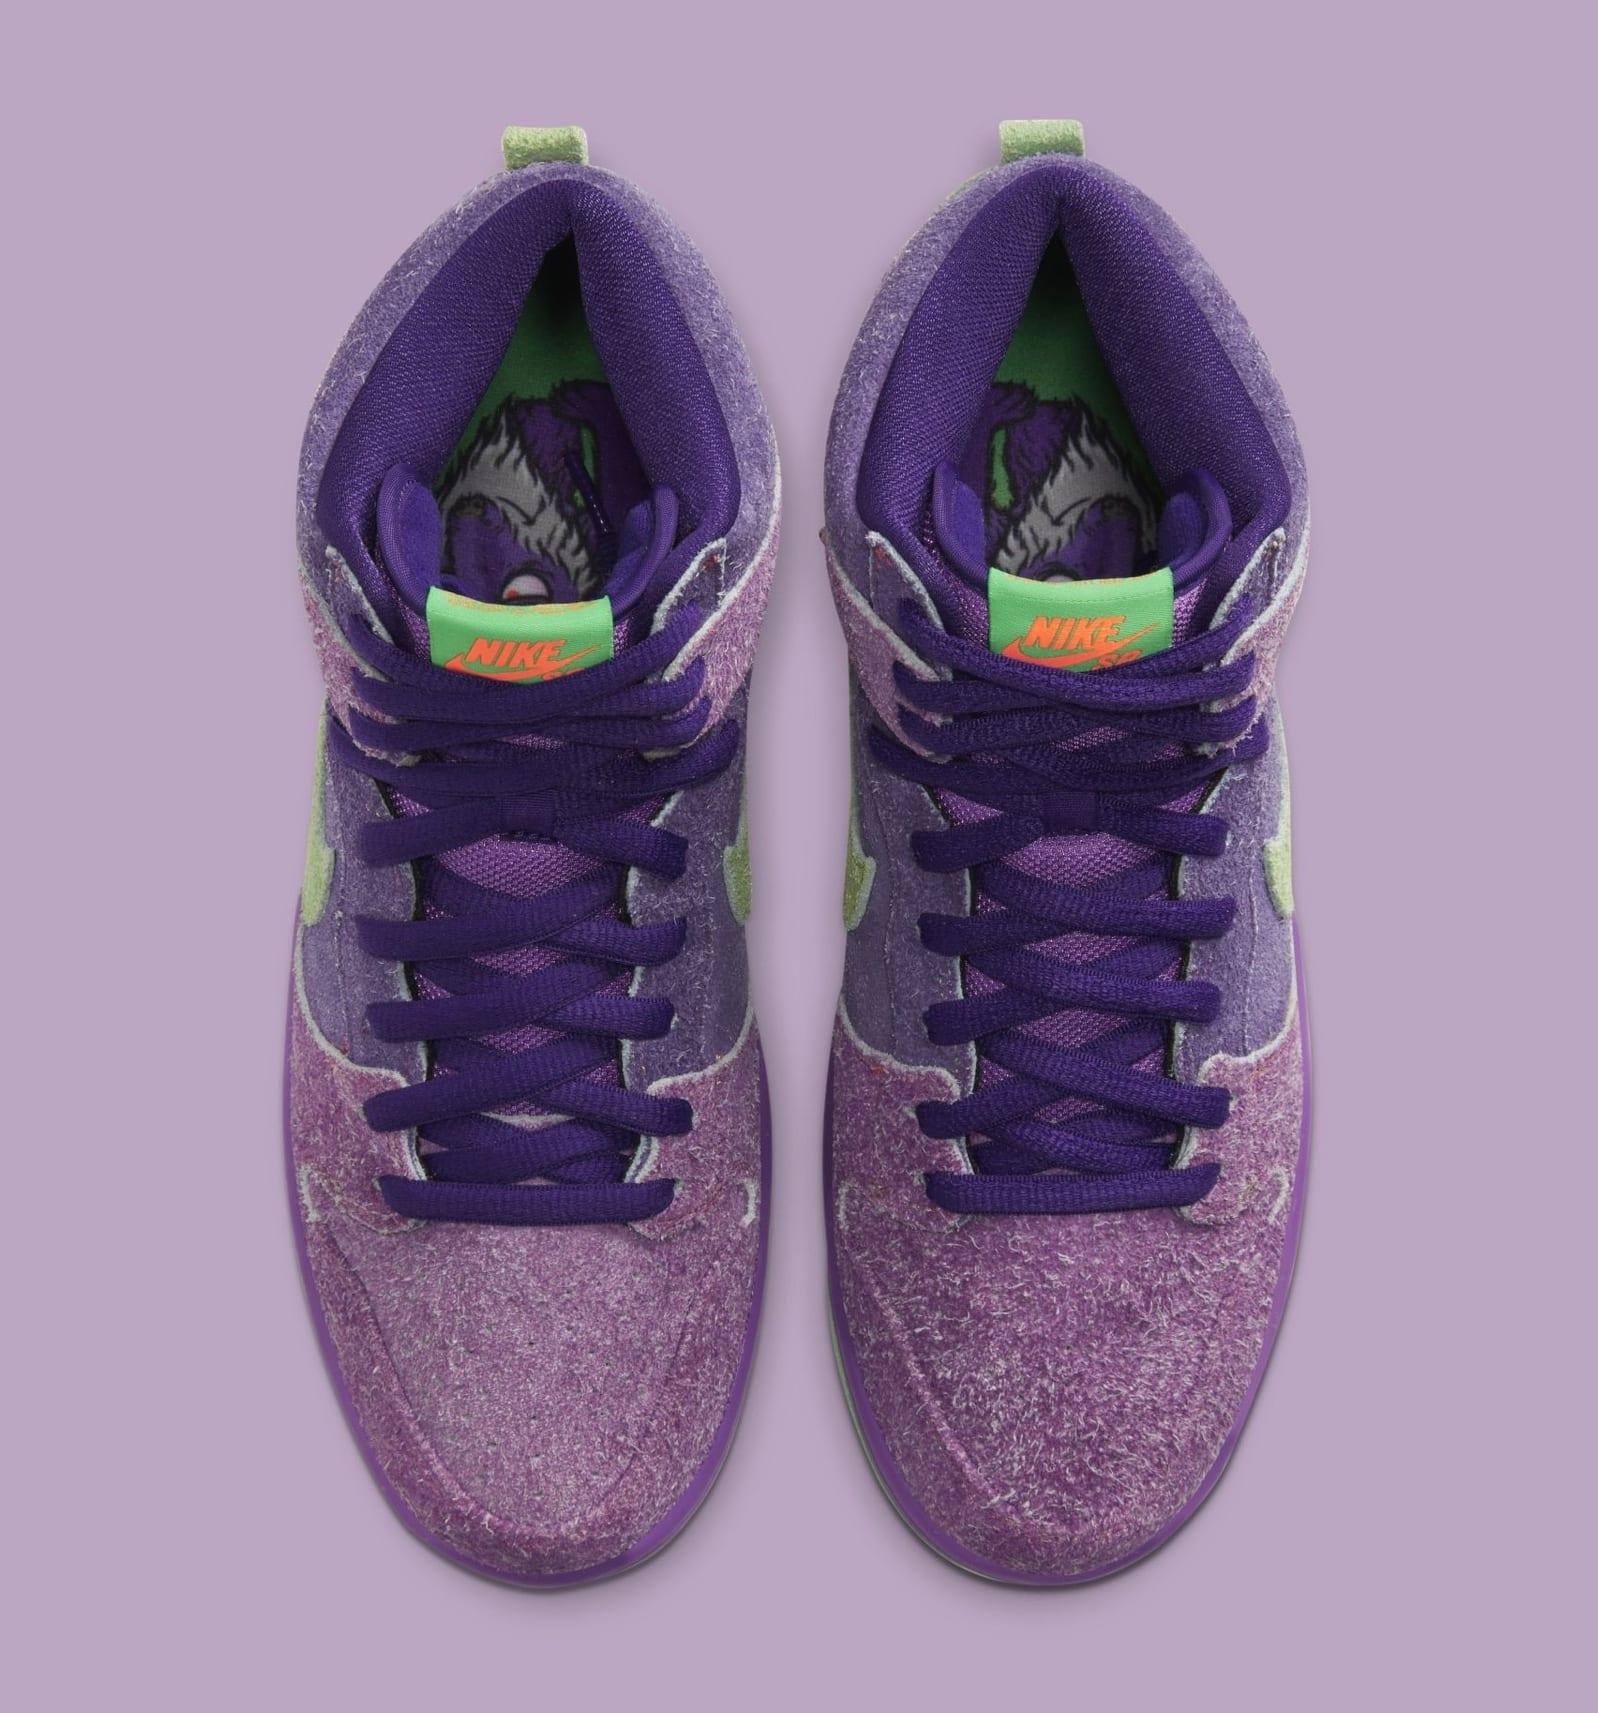 Nike SB Dunk High '420' 2020 Top